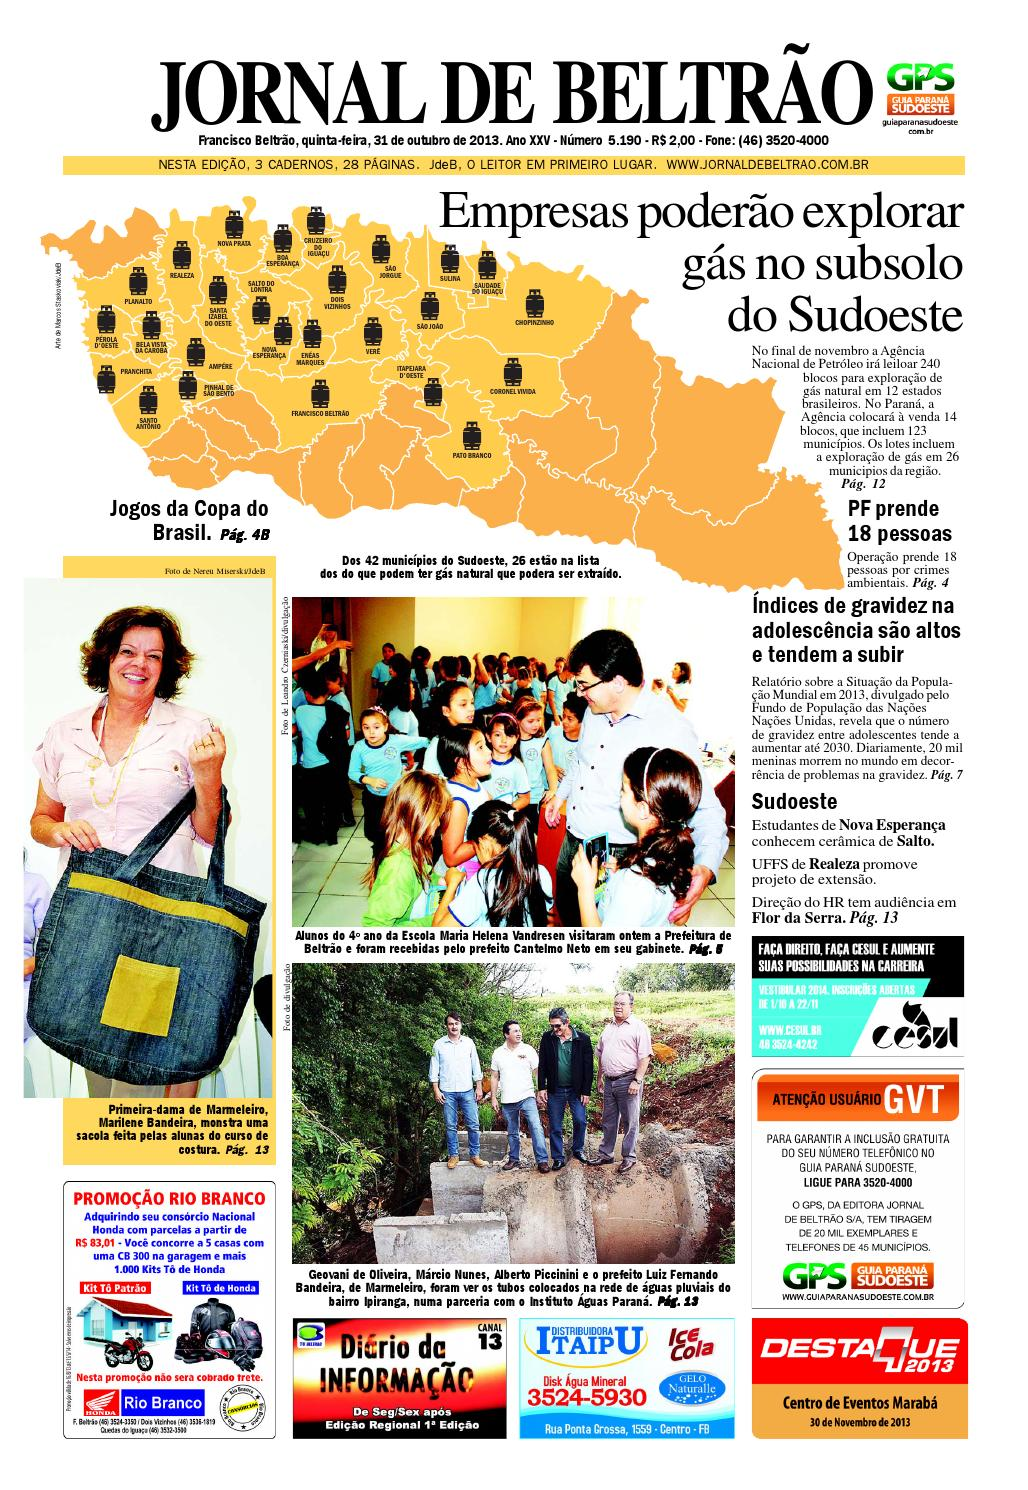 Jornaldebeltrao 5190 31-10-2013.pdf by Orangotoe - issuu 47a766beffb33